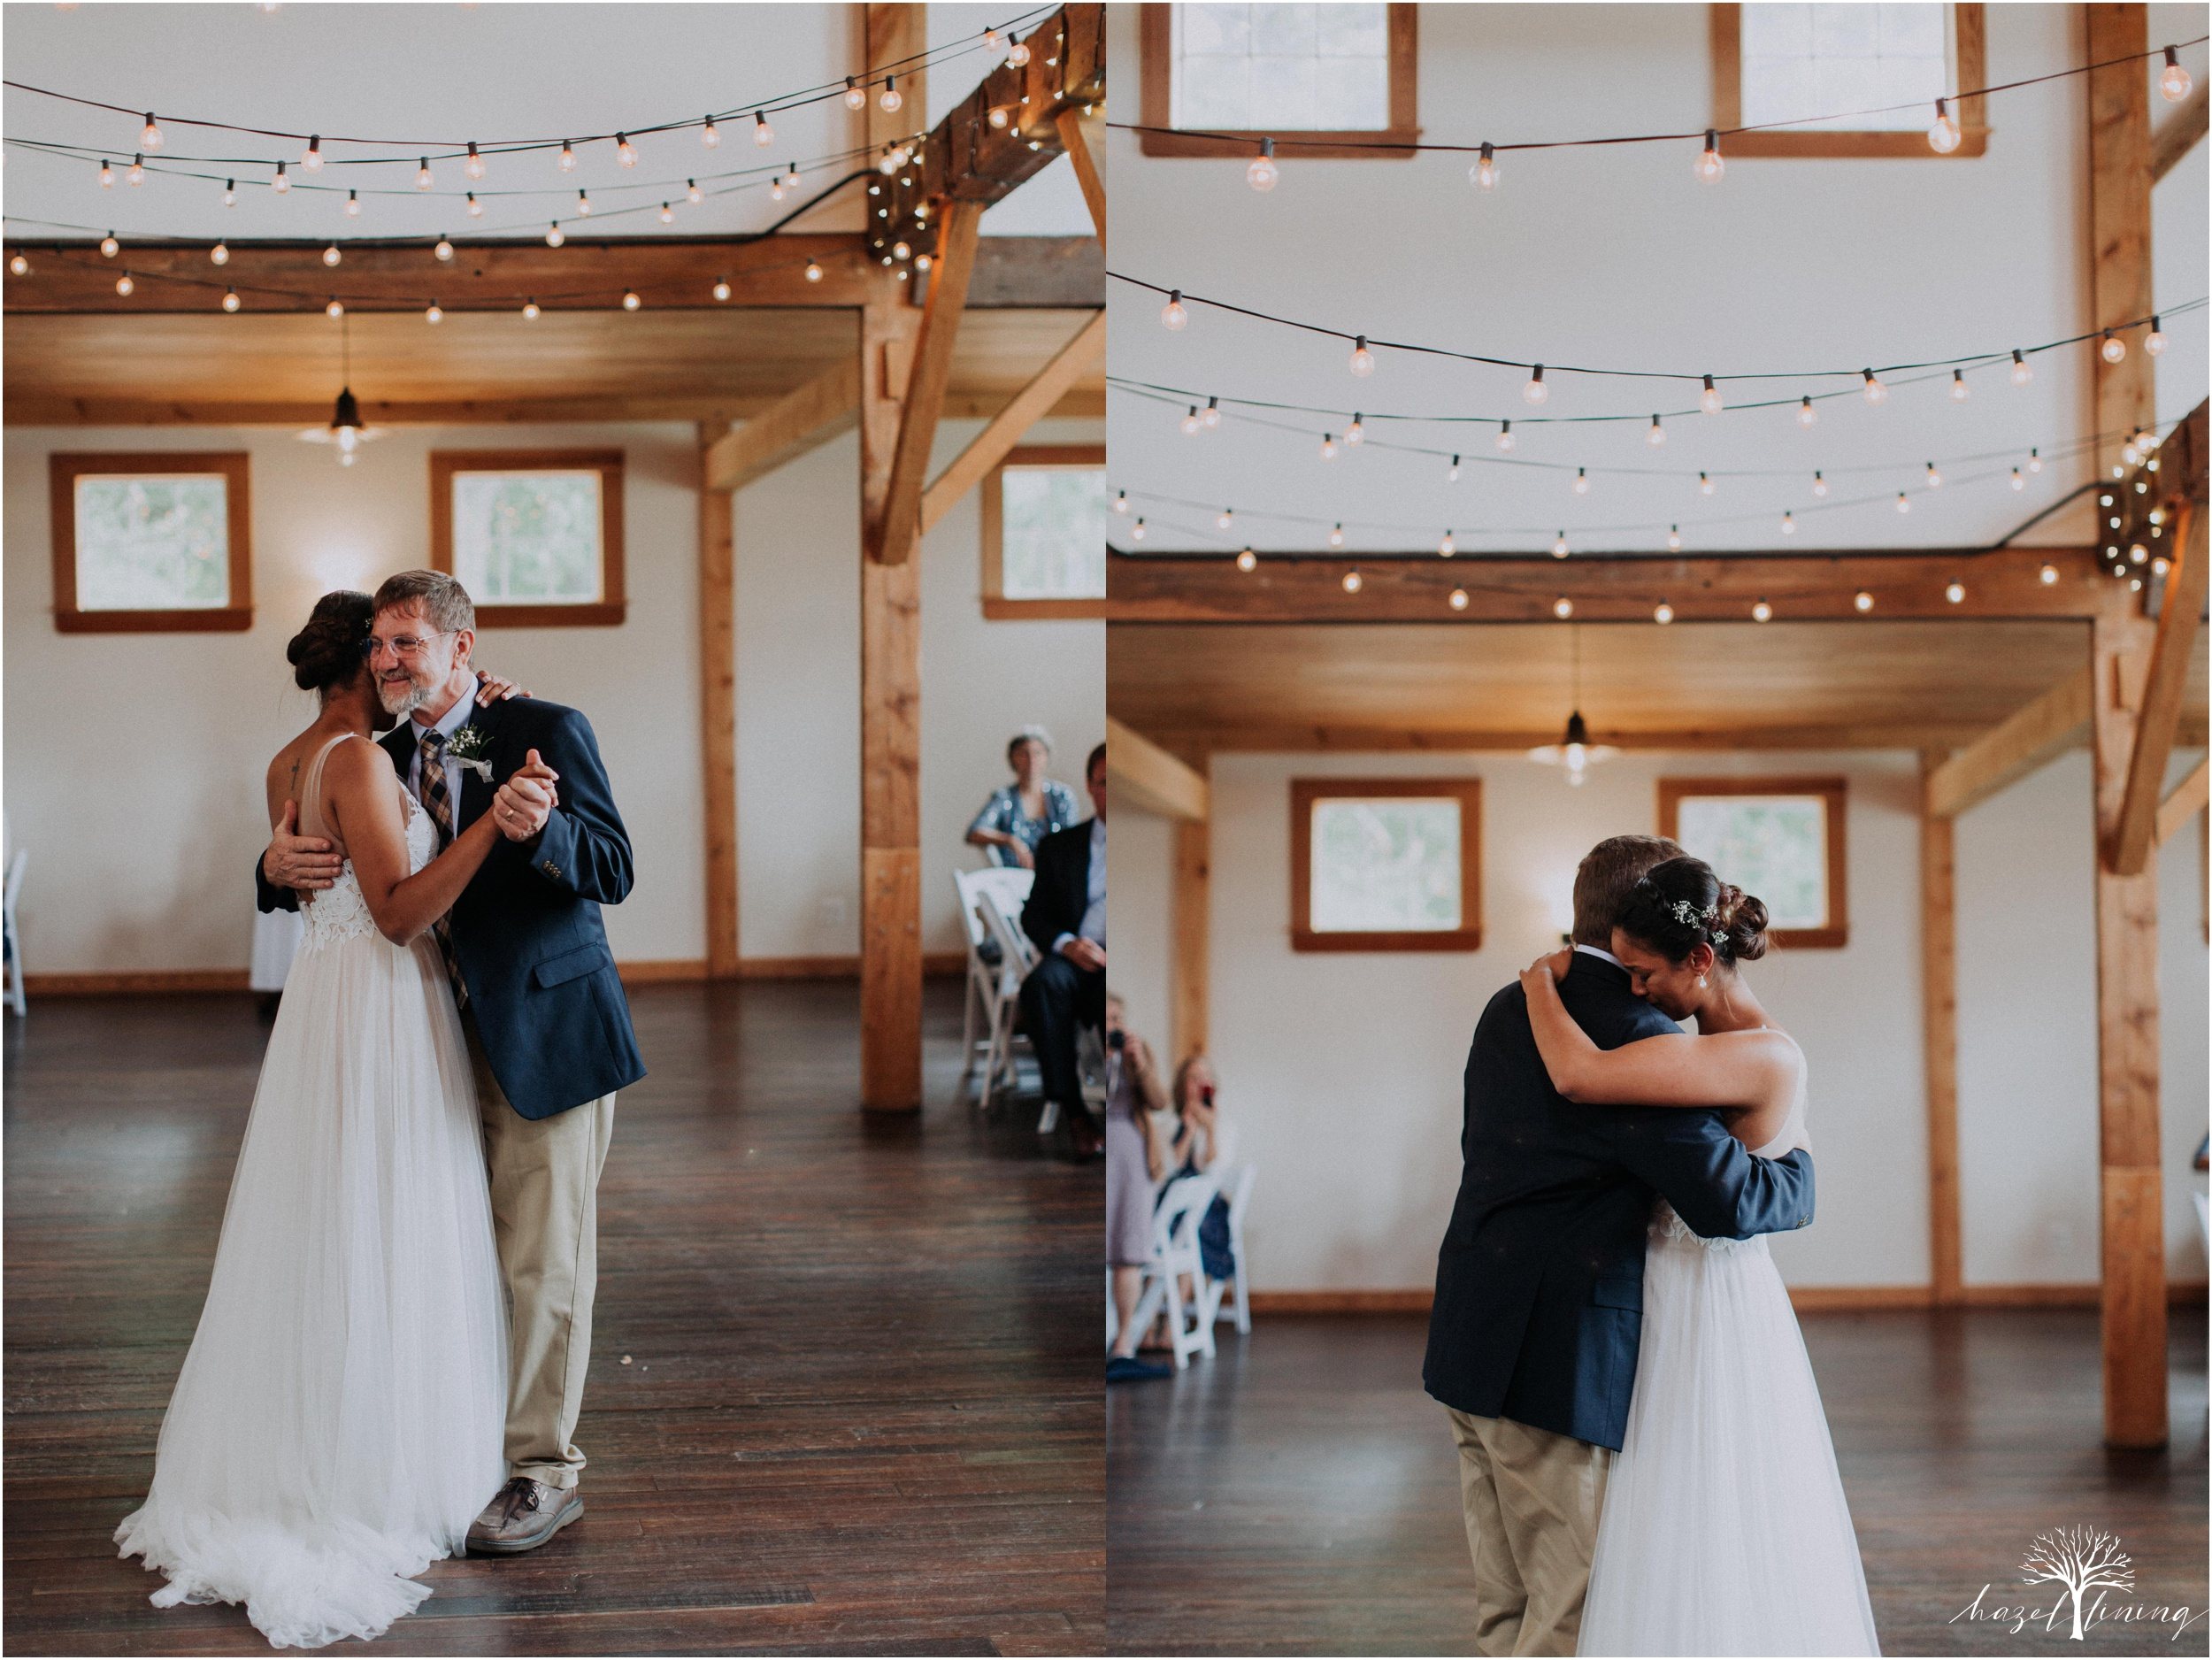 mariah-kreyling-samuel-sherratt-sherrattwiththeworld-peirce-farm-at-witch-hill-boston-massachusetts-wedding-photography-hazel-lining-travel-wedding-elopement-photography_0170.jpg